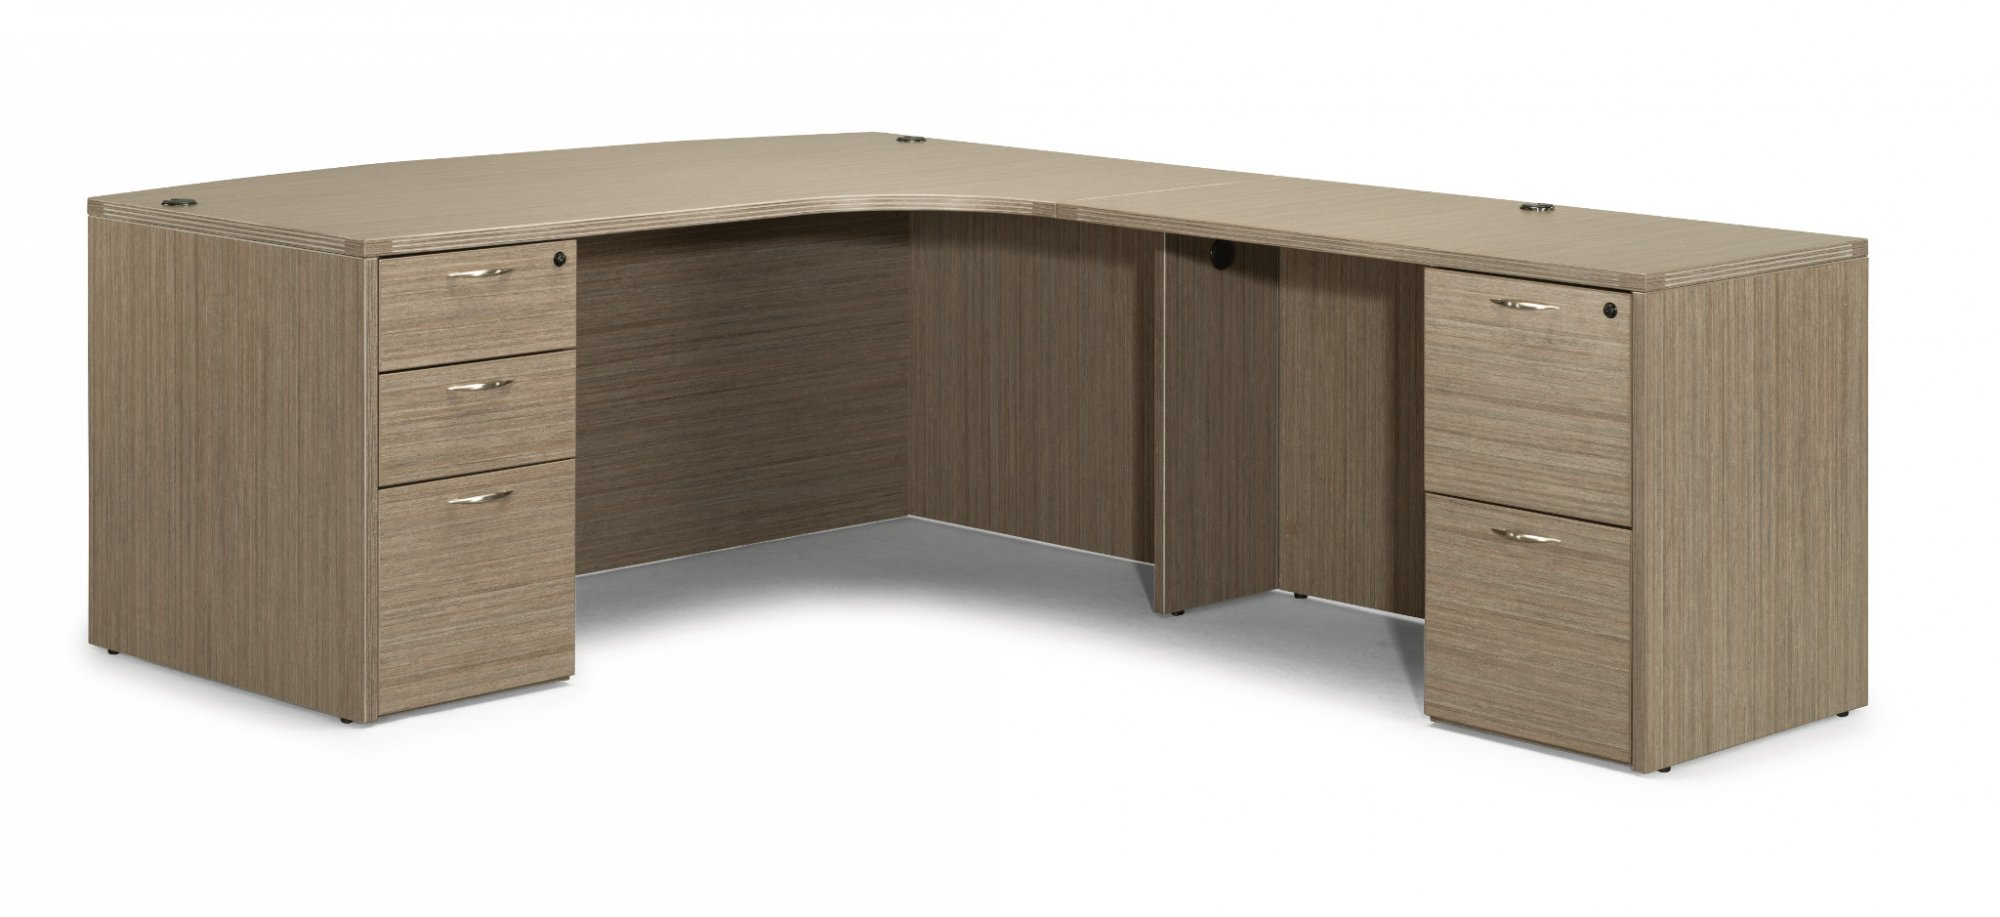 Flexsteel Fairplex  Right Executive Corner Bow Front L Desk